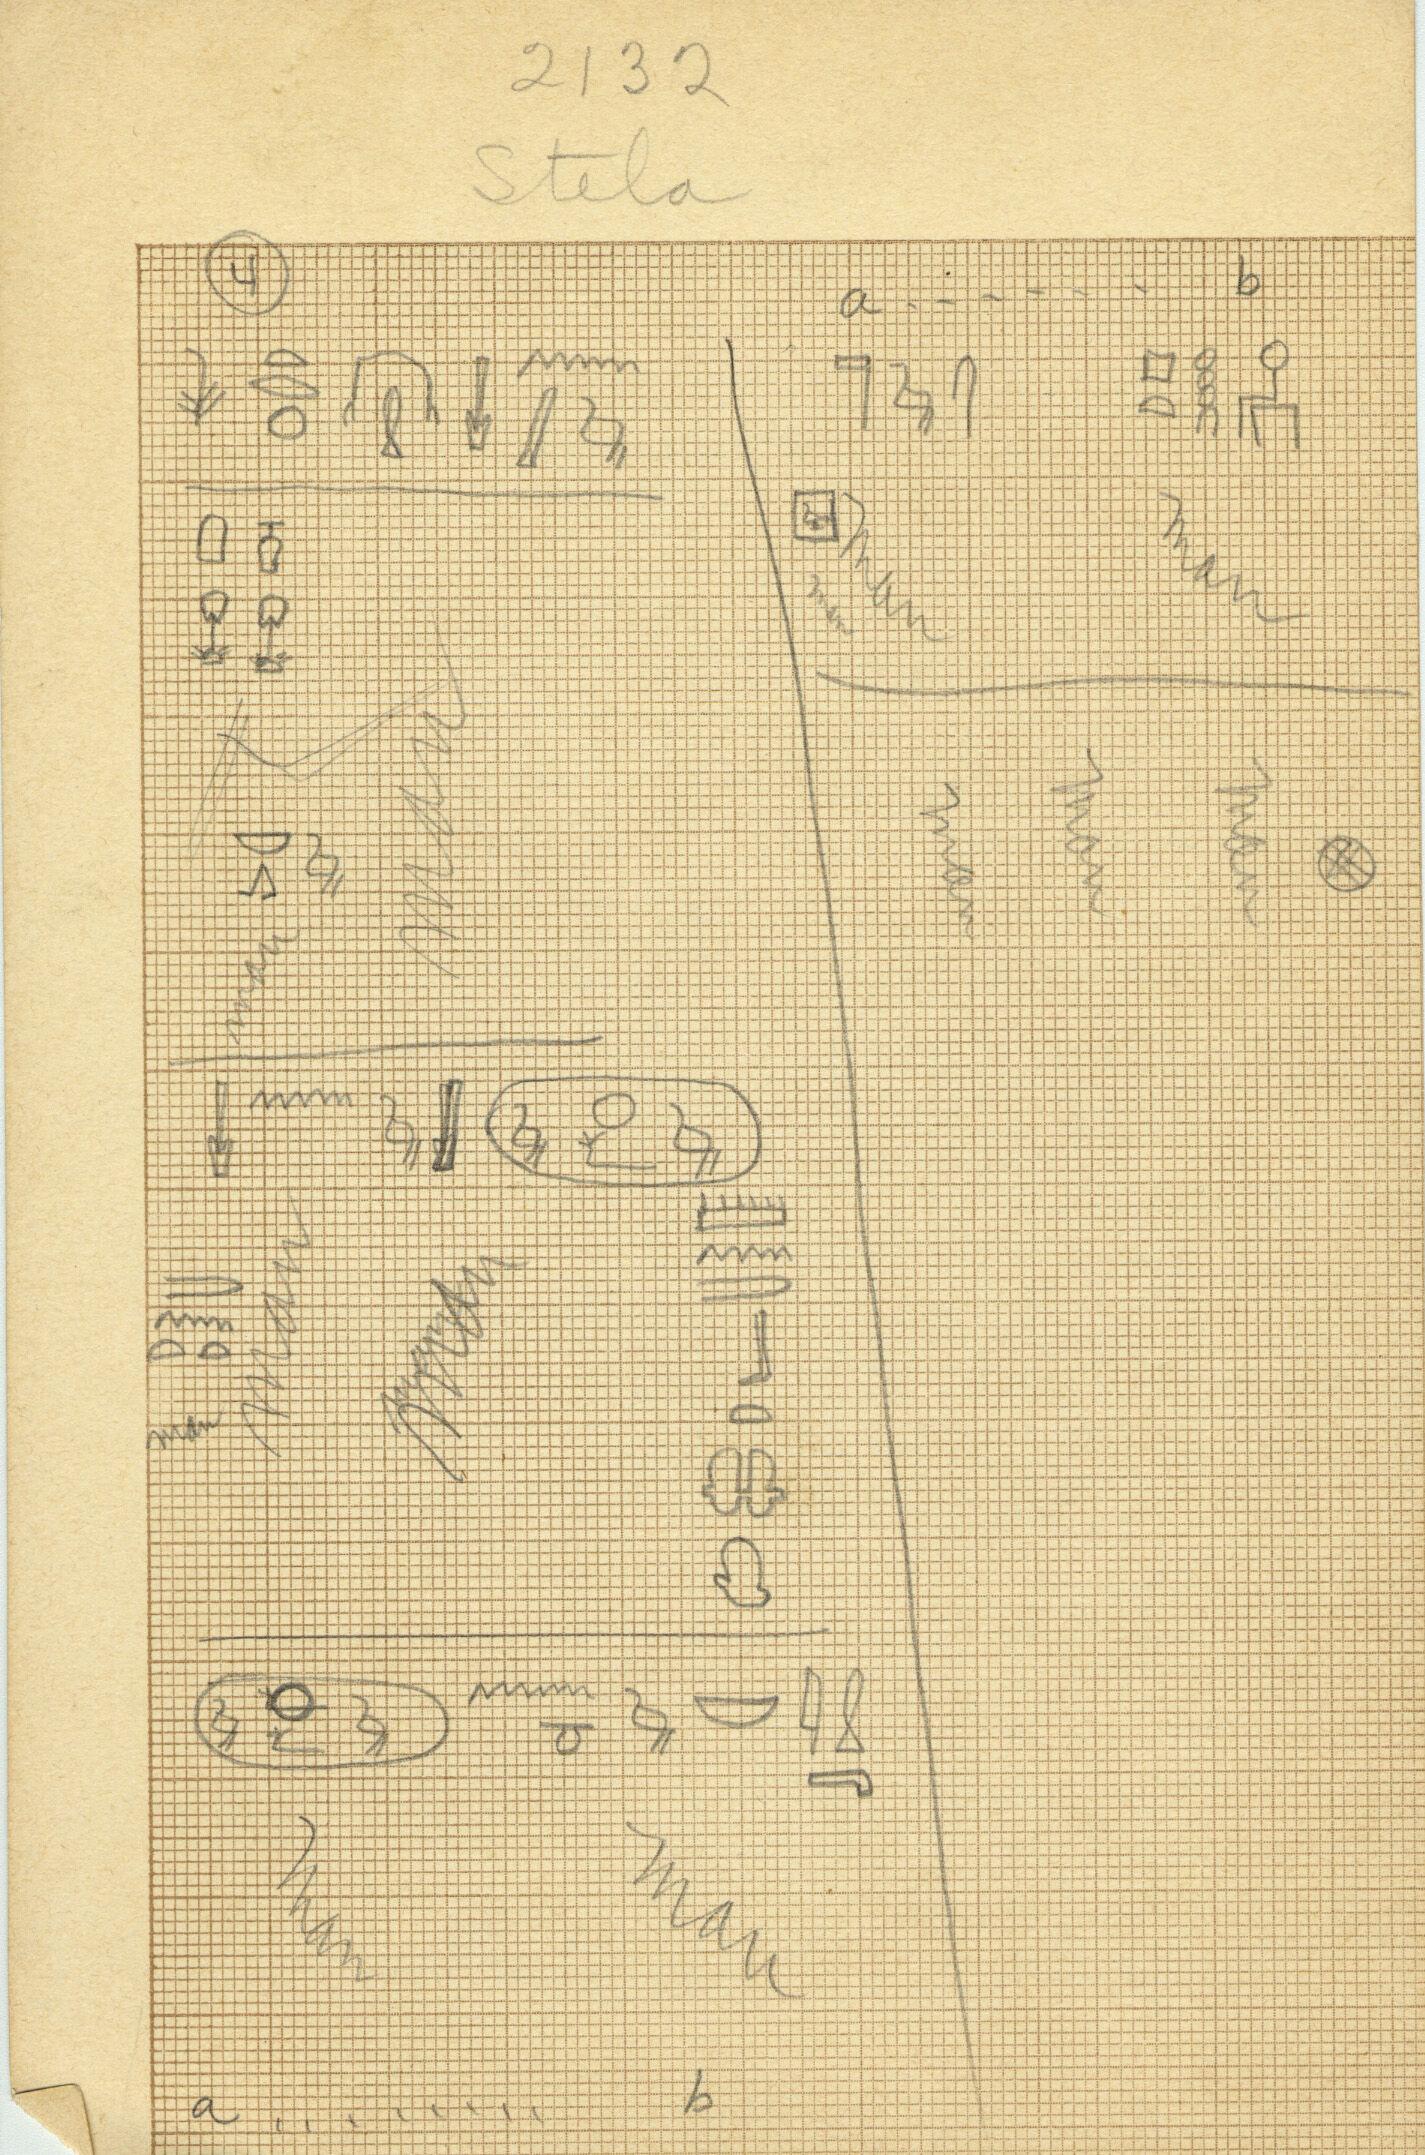 Drawings: G 2132, False door inscription notes